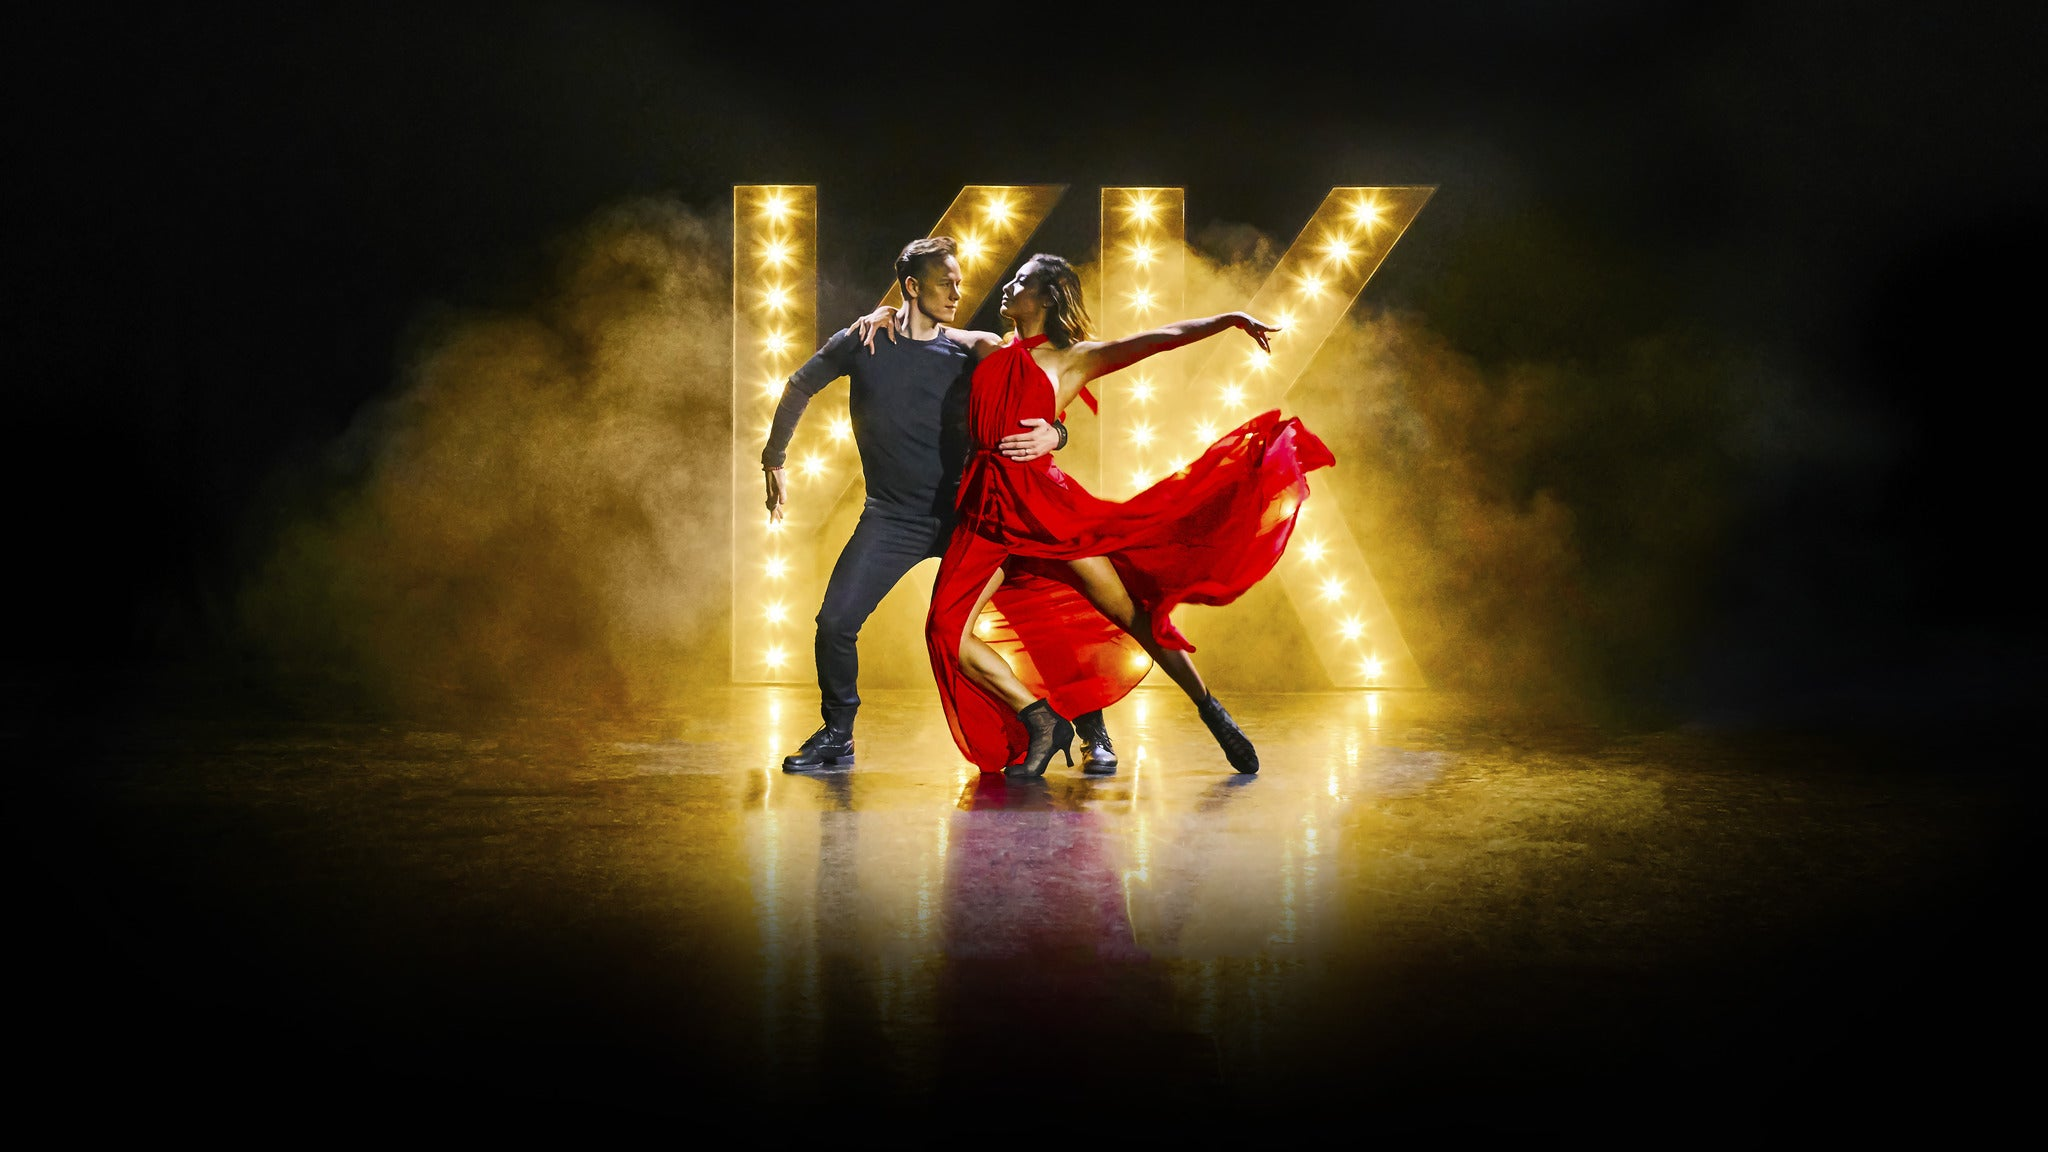 Kevin & Karen Dance - The Live Tour 2018